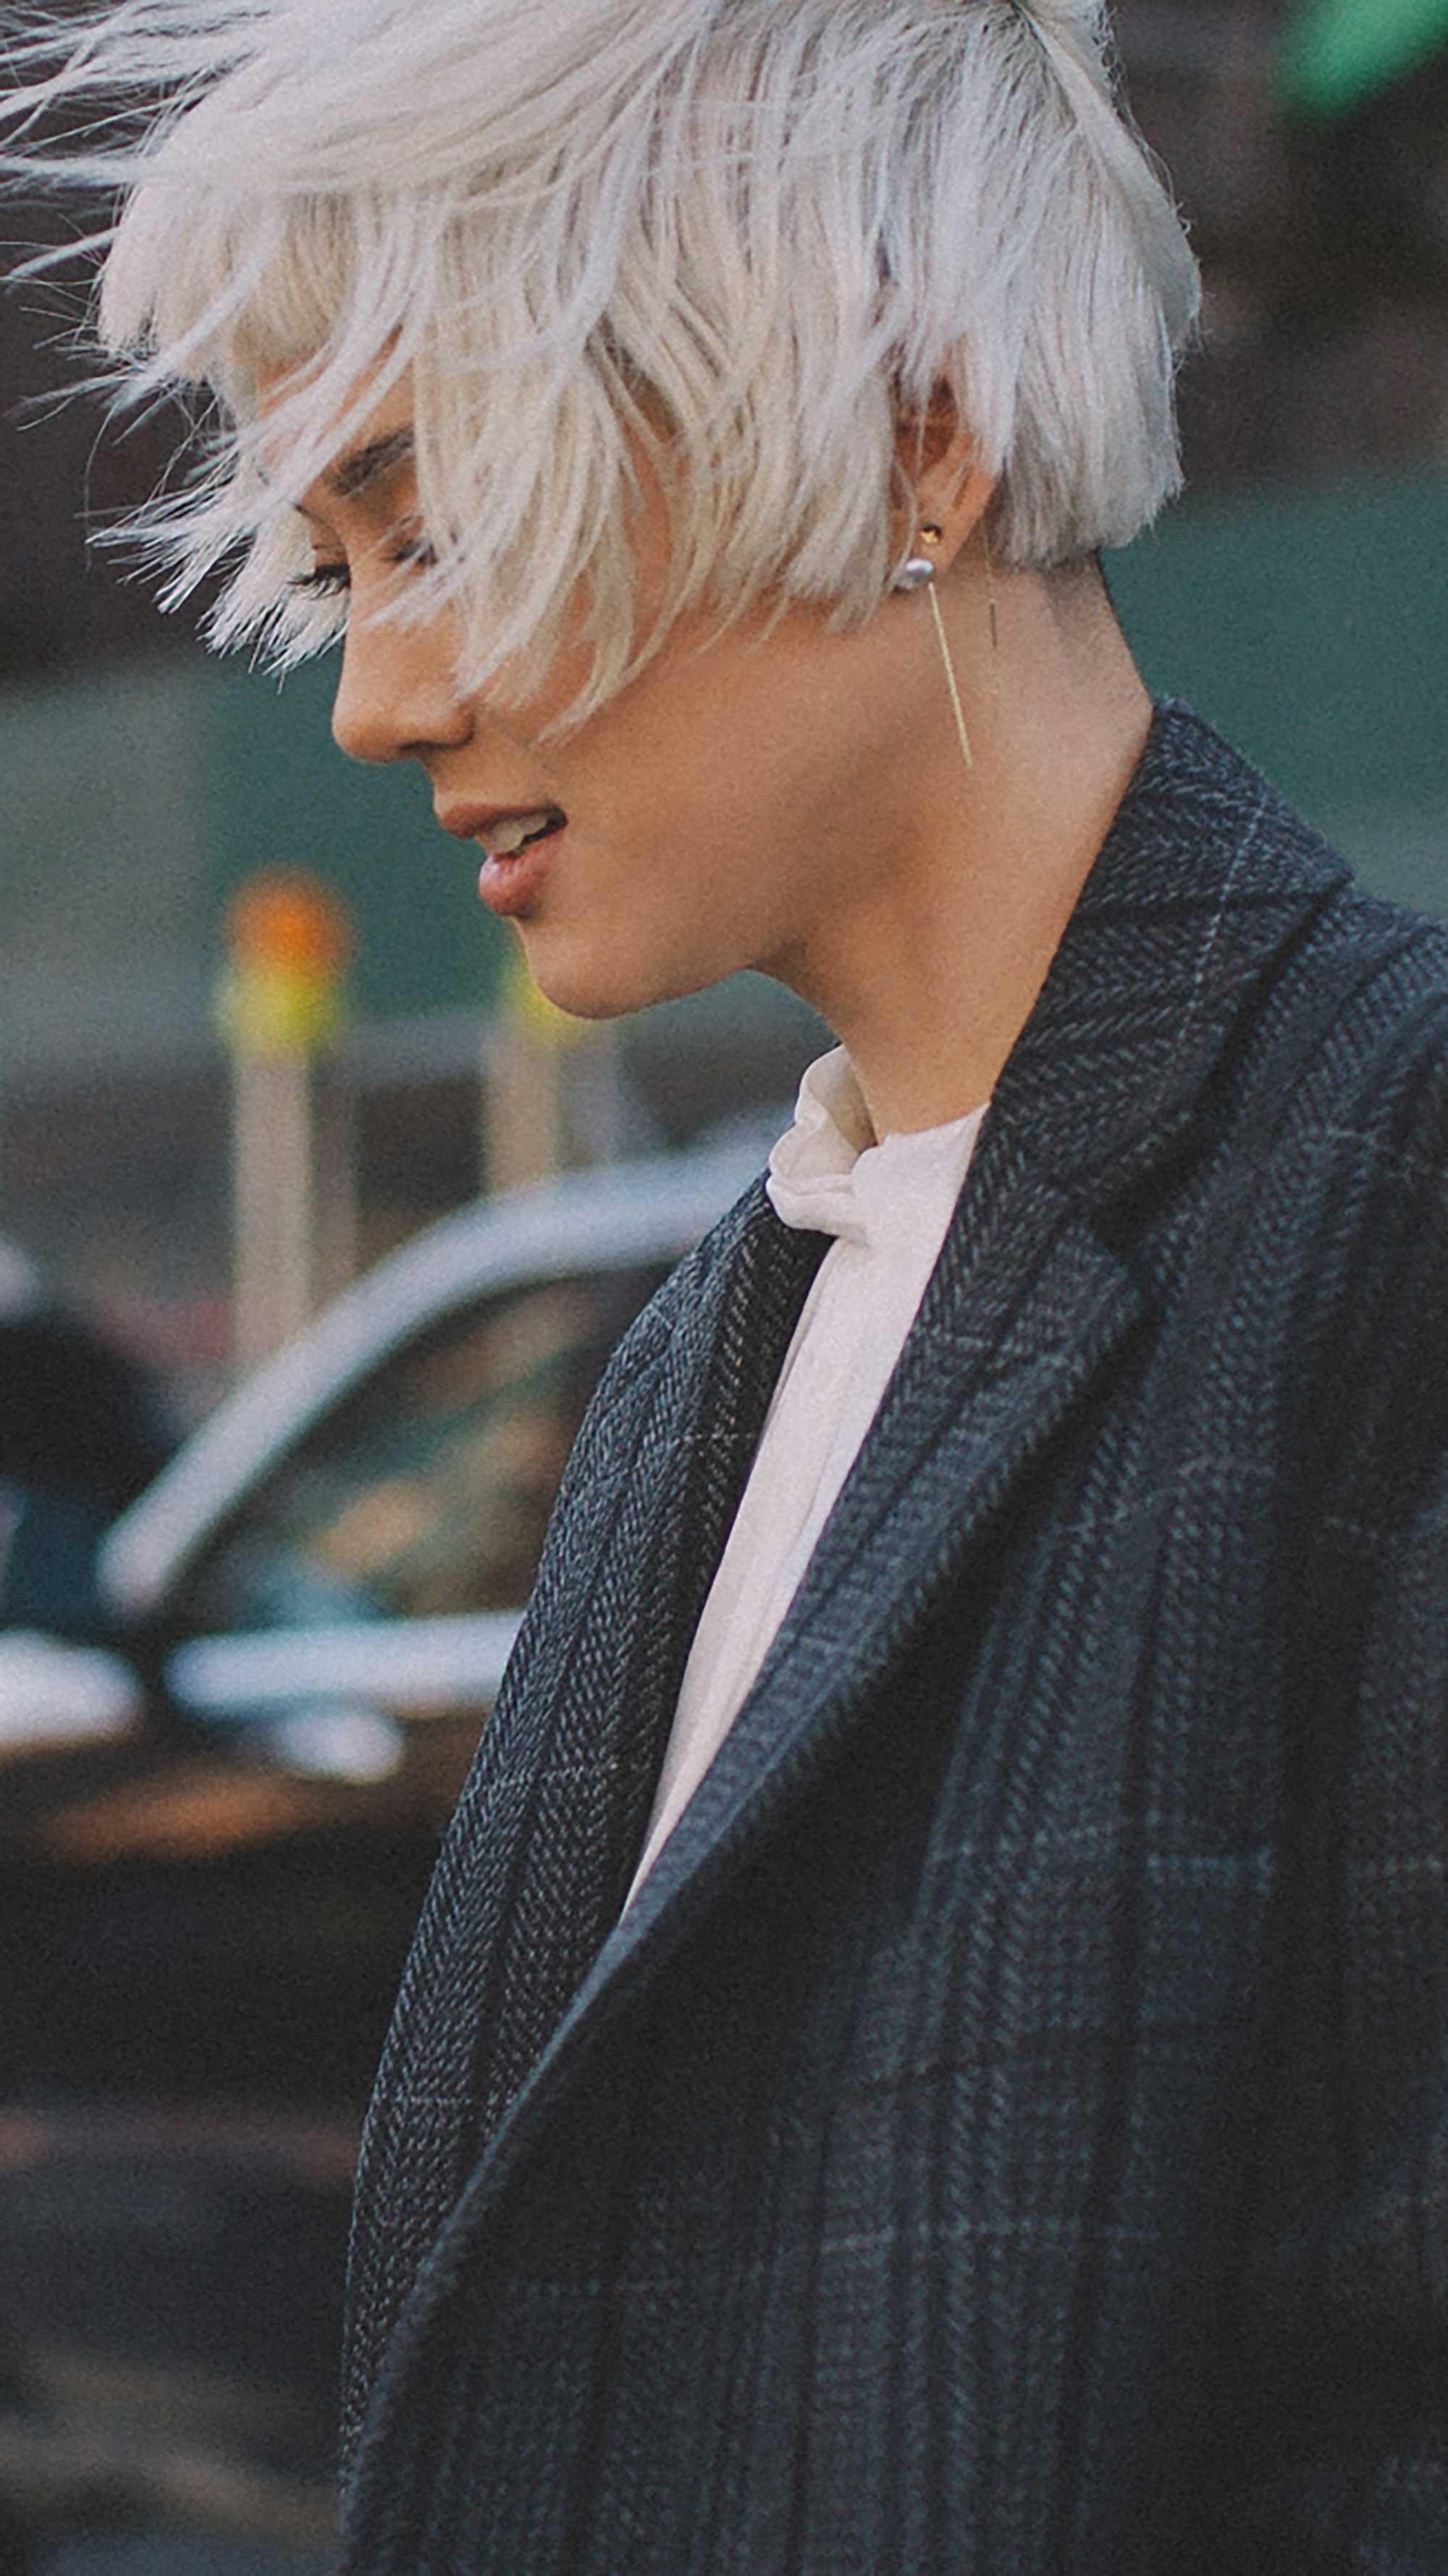 Best outfits of New York Fashion Week street style day three NYFW FW19 - 49.jpg